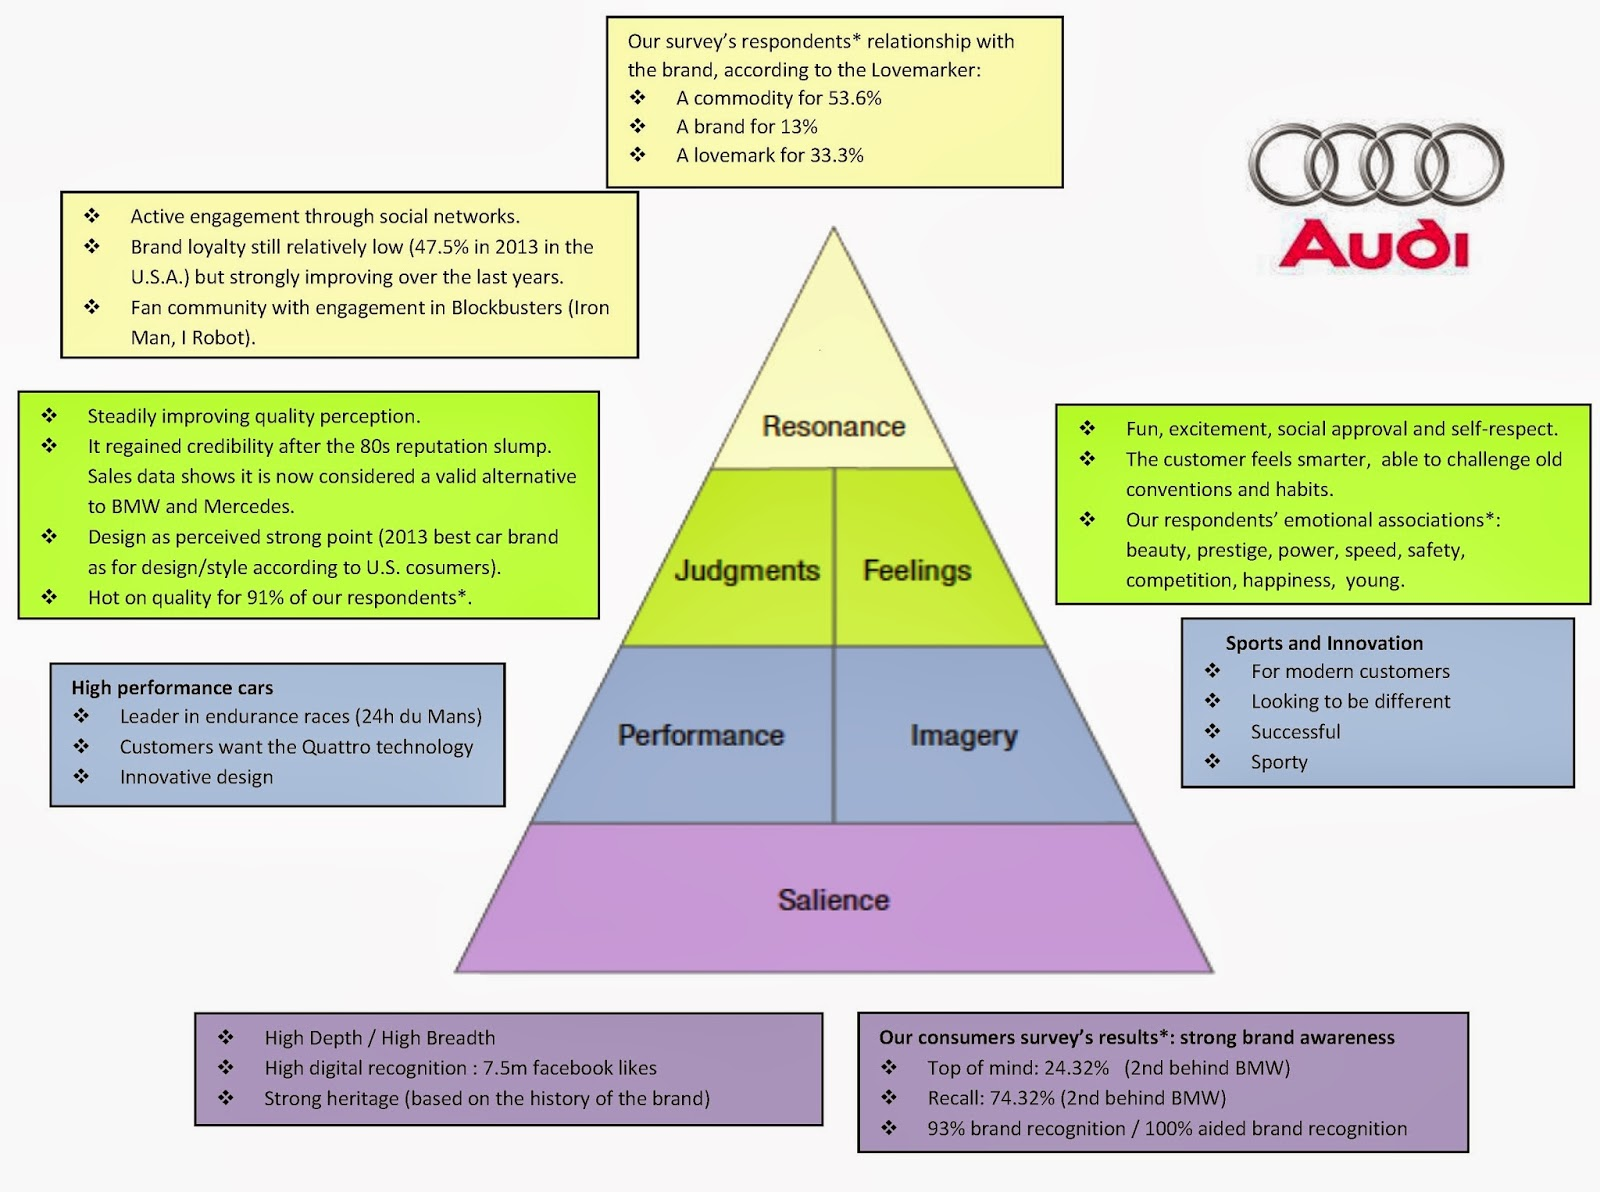 the branding pyramid